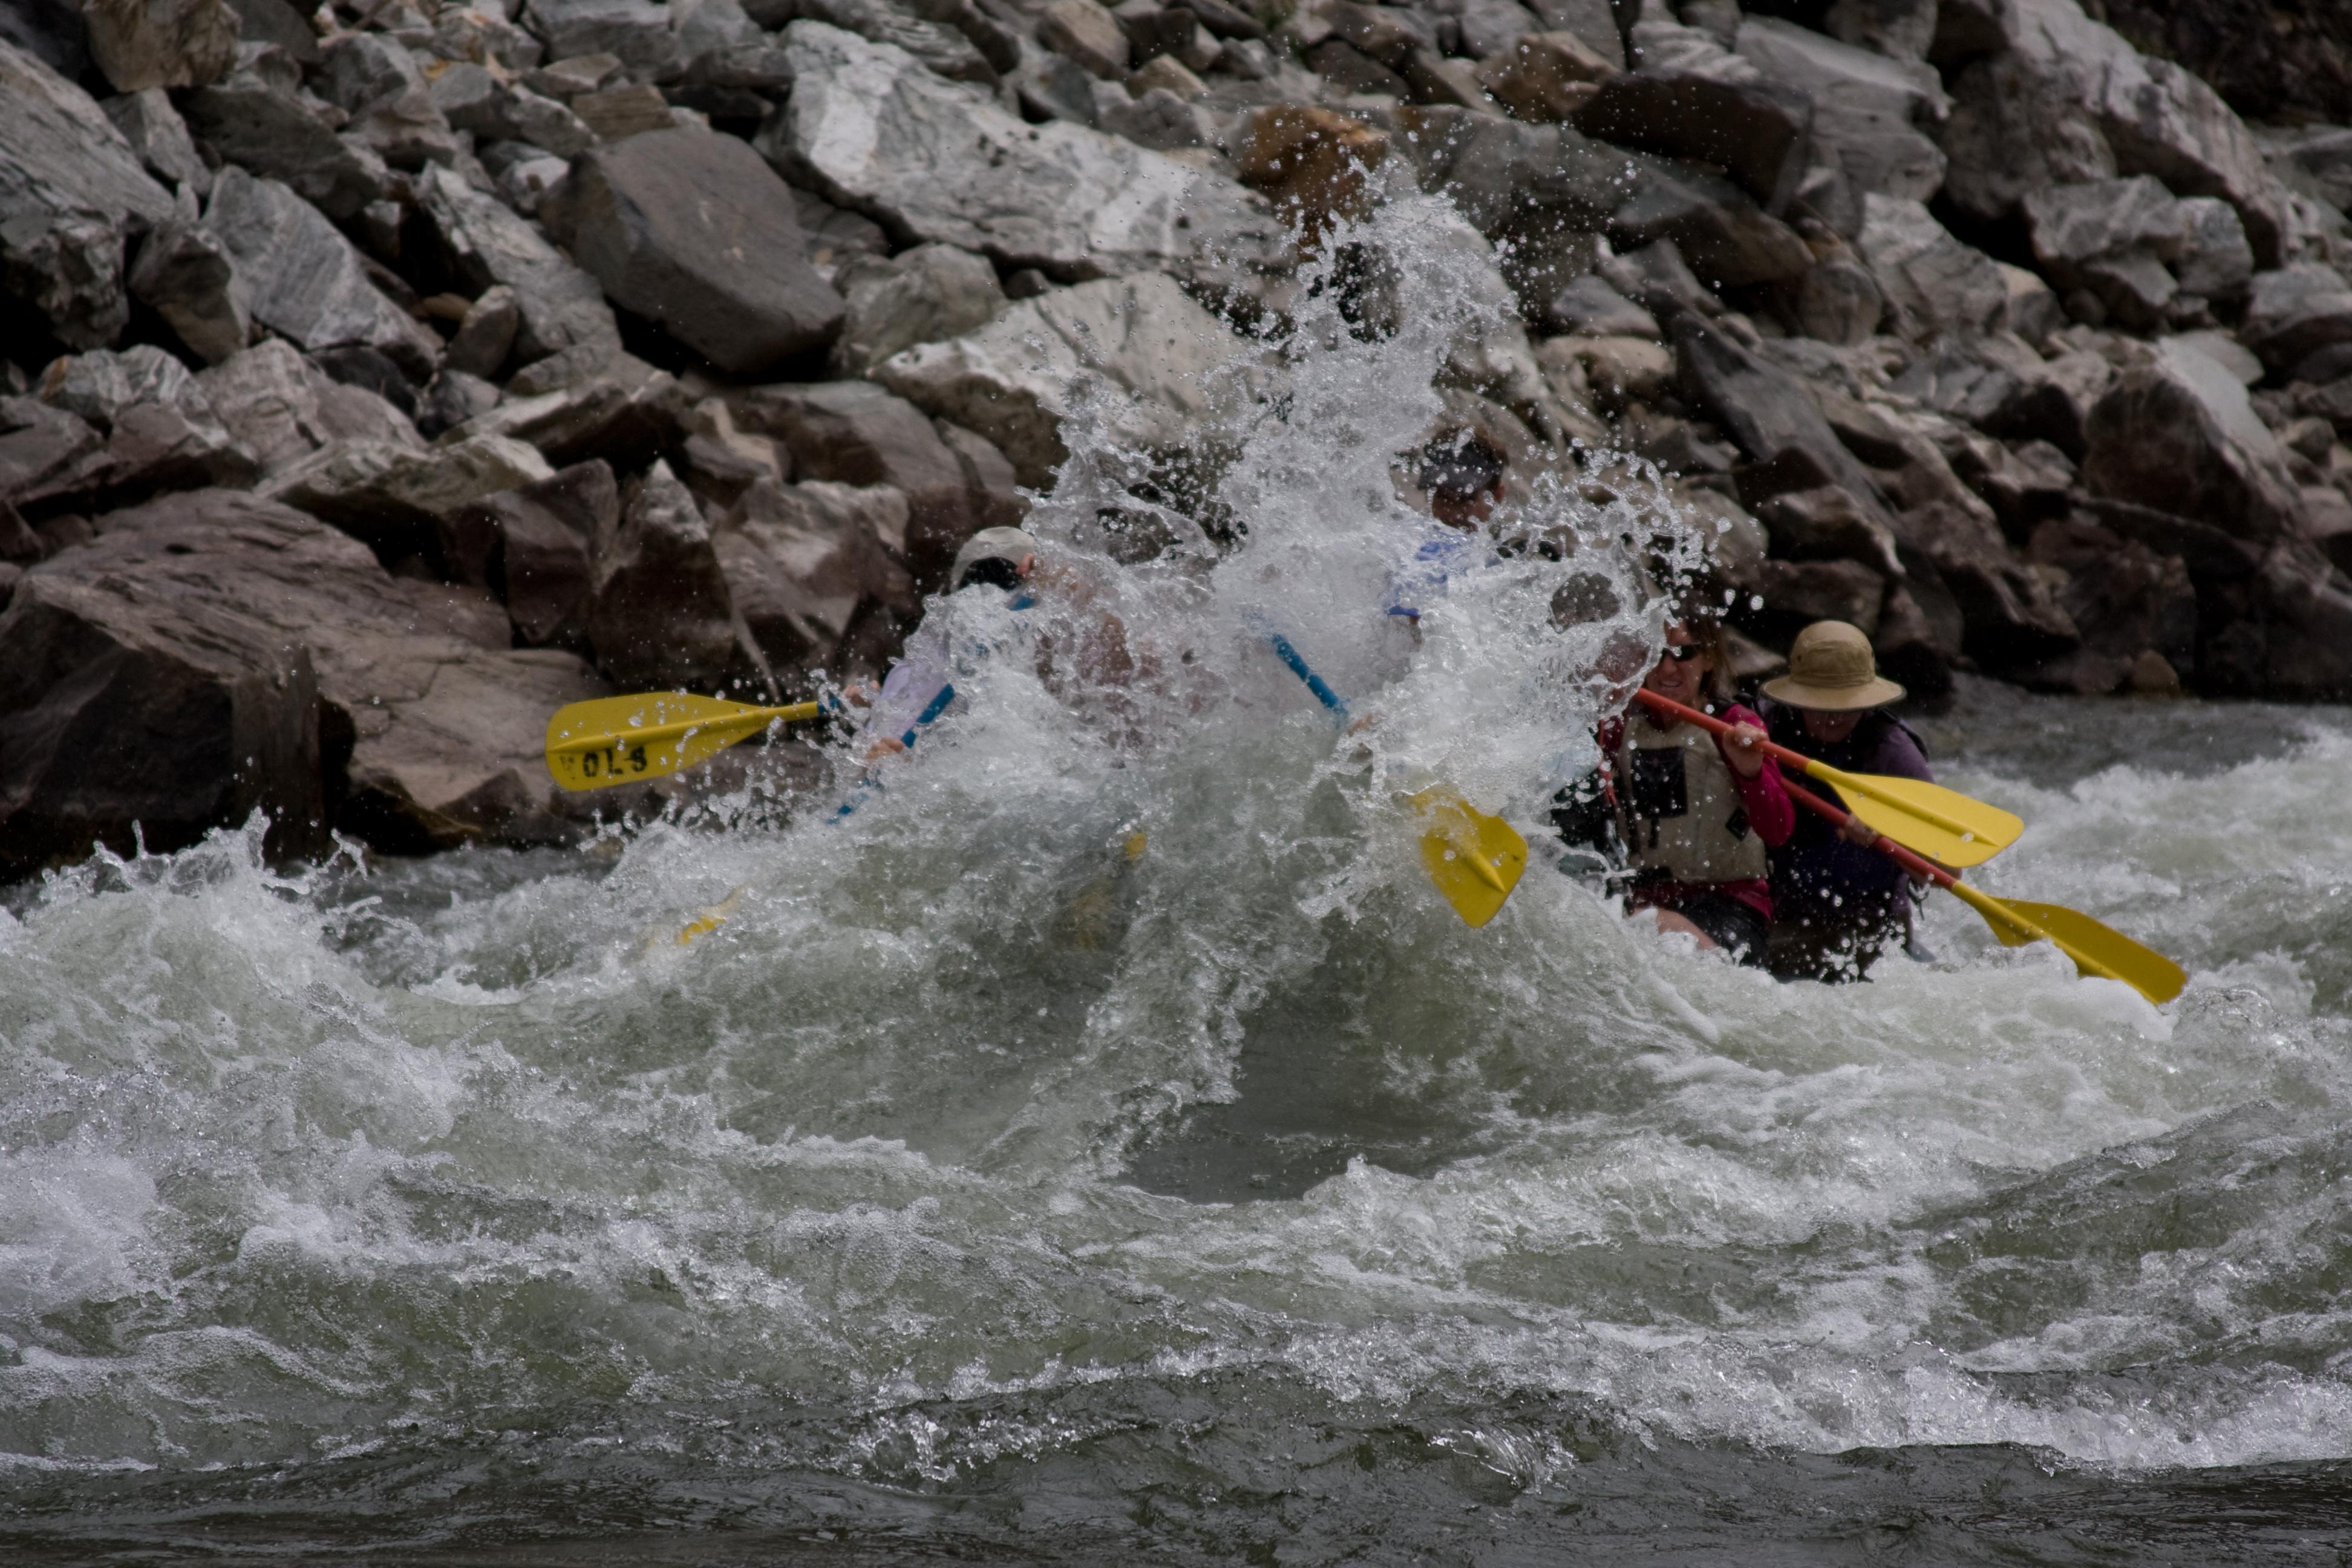 Summer Program - Kayaking | NOLS Salmon River Adventure